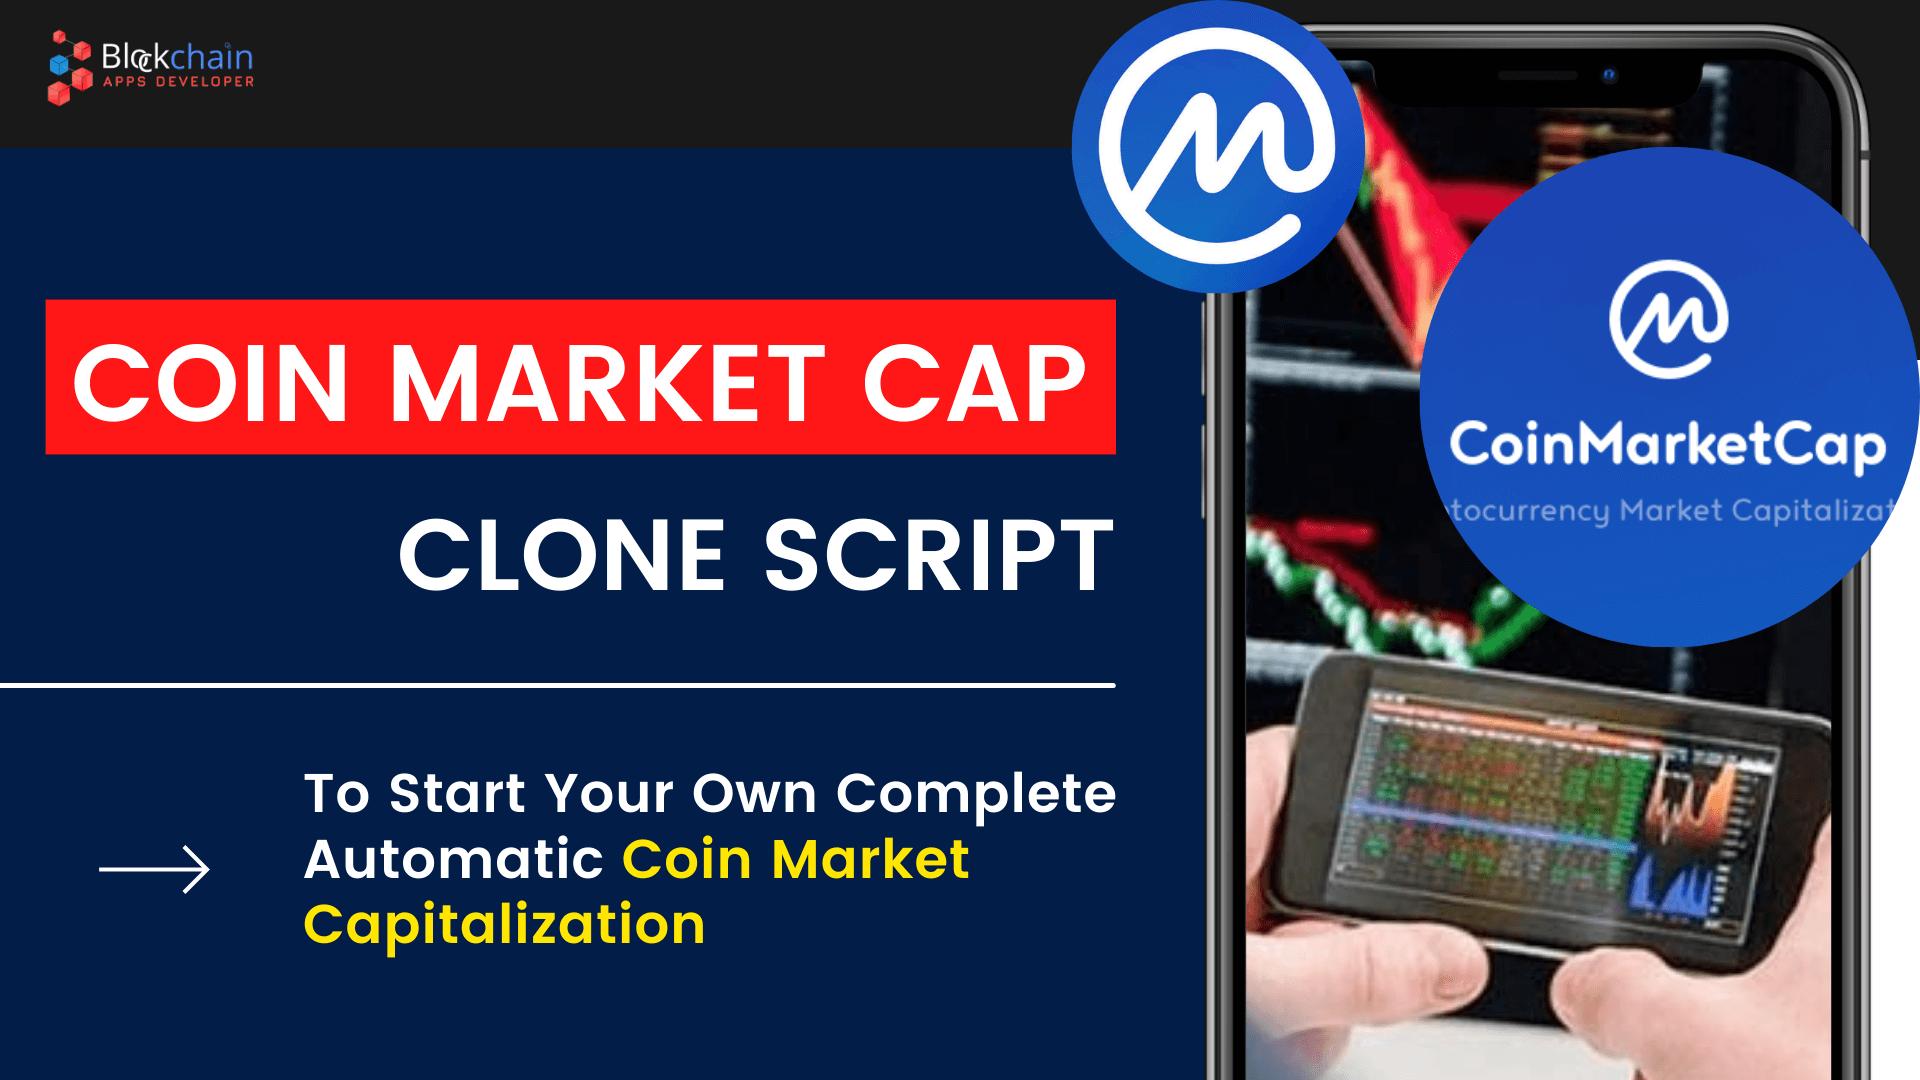 https://res.cloudinary.com/dt9okciwh/image/upload/v1621849701/blockchainappsdeveloper/coinmarketcap-clone-script-software.png